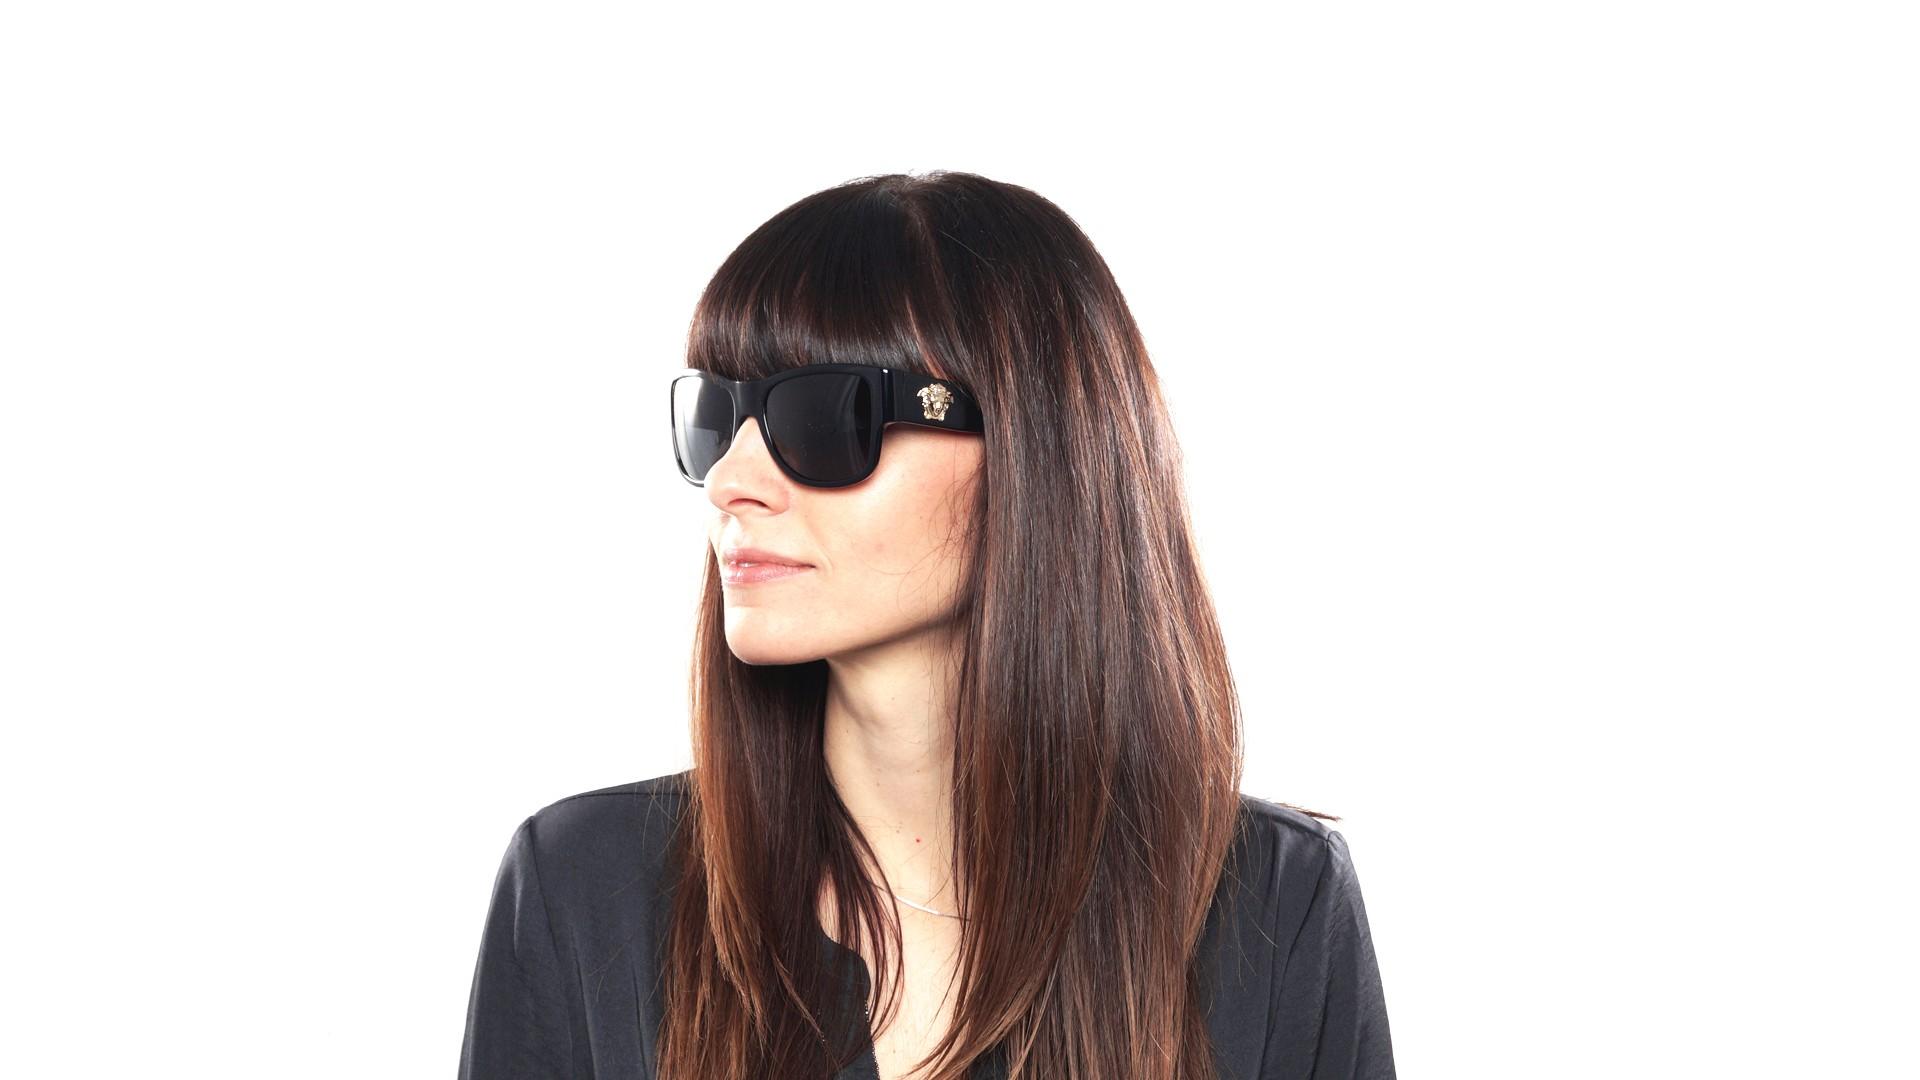 ba4a9d3acdb Sunglasses Versace VE4275 Gb187 58-18 Black Large